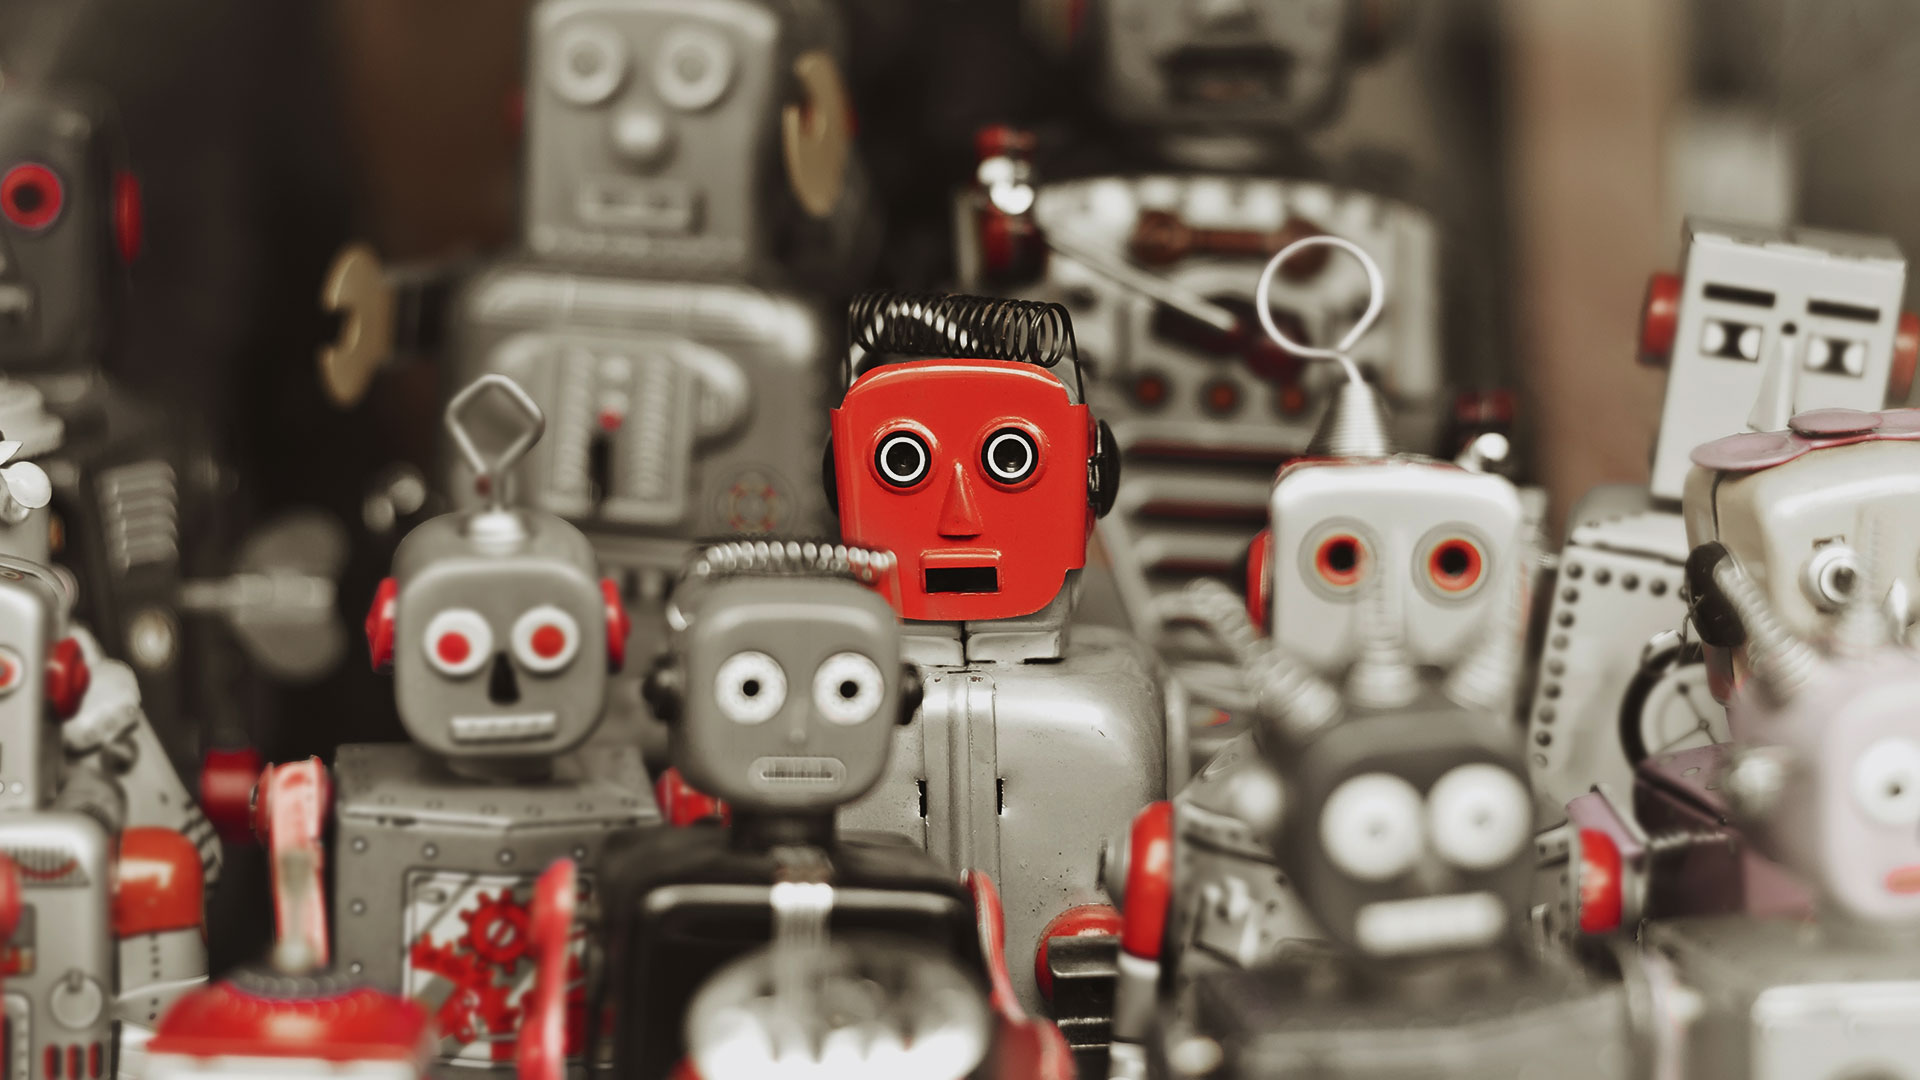 robots-txt-automation1-ss-1920